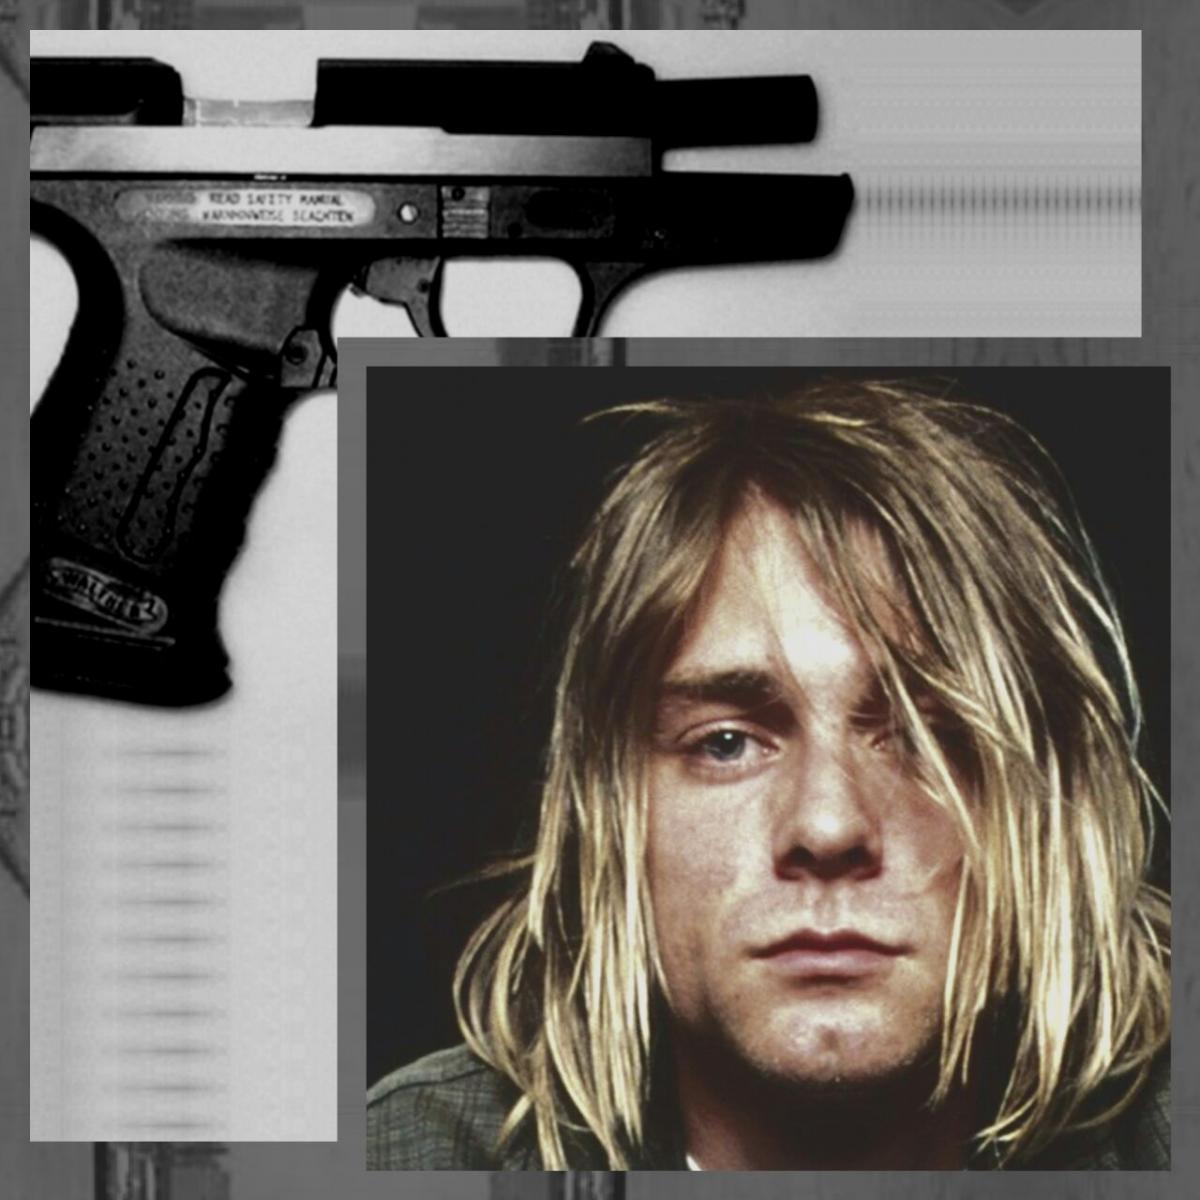 Upcoming: Yung Cobain - XXXTentacion